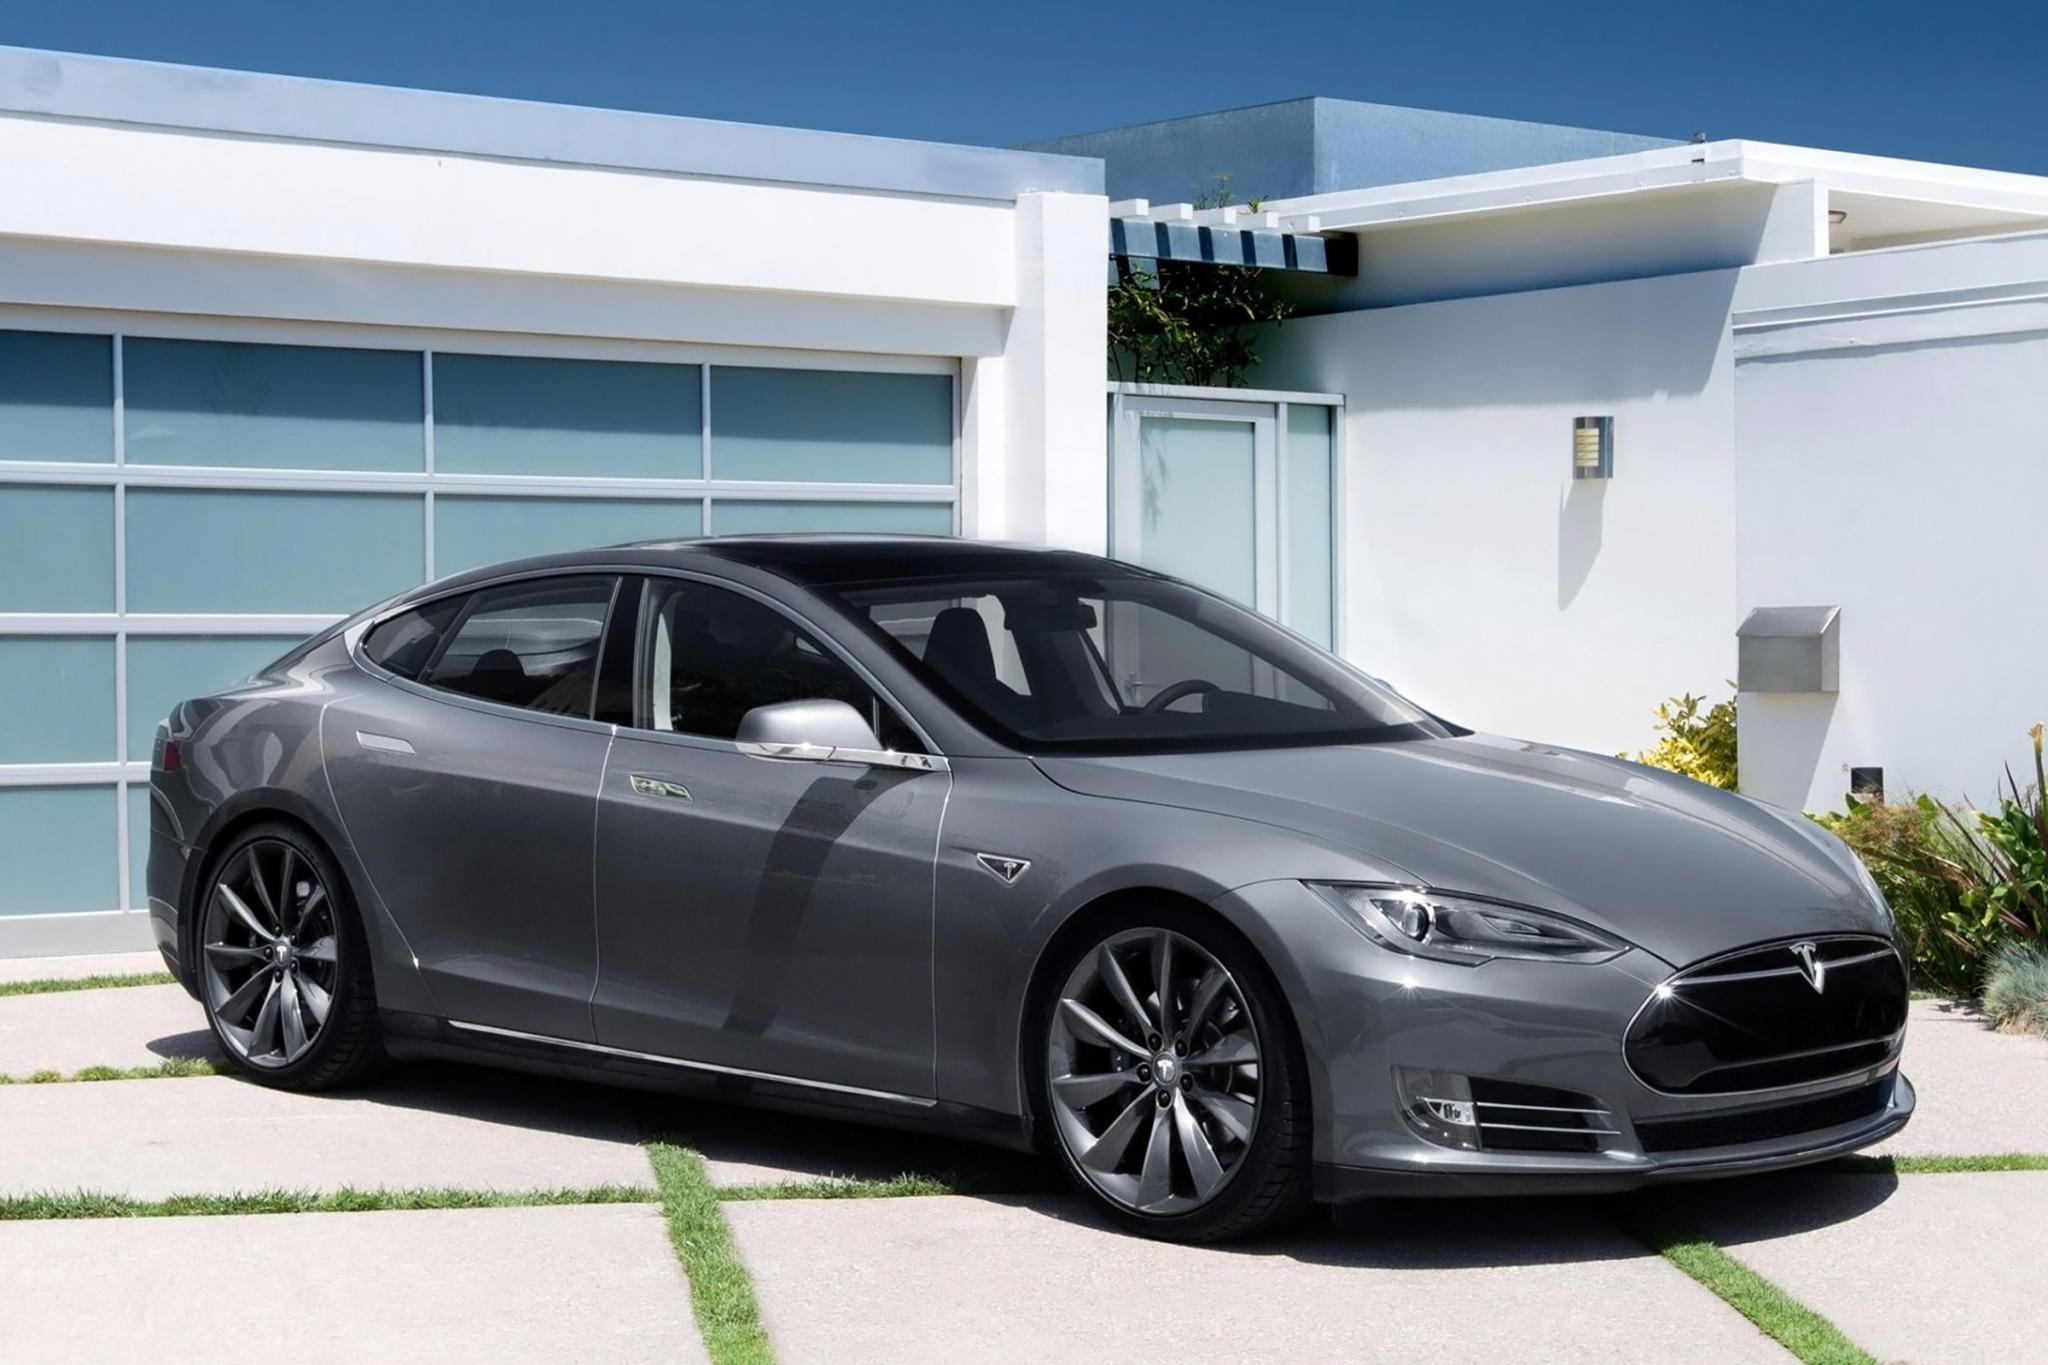 Tesla Model S I 2012 - 2016 Liftback #3